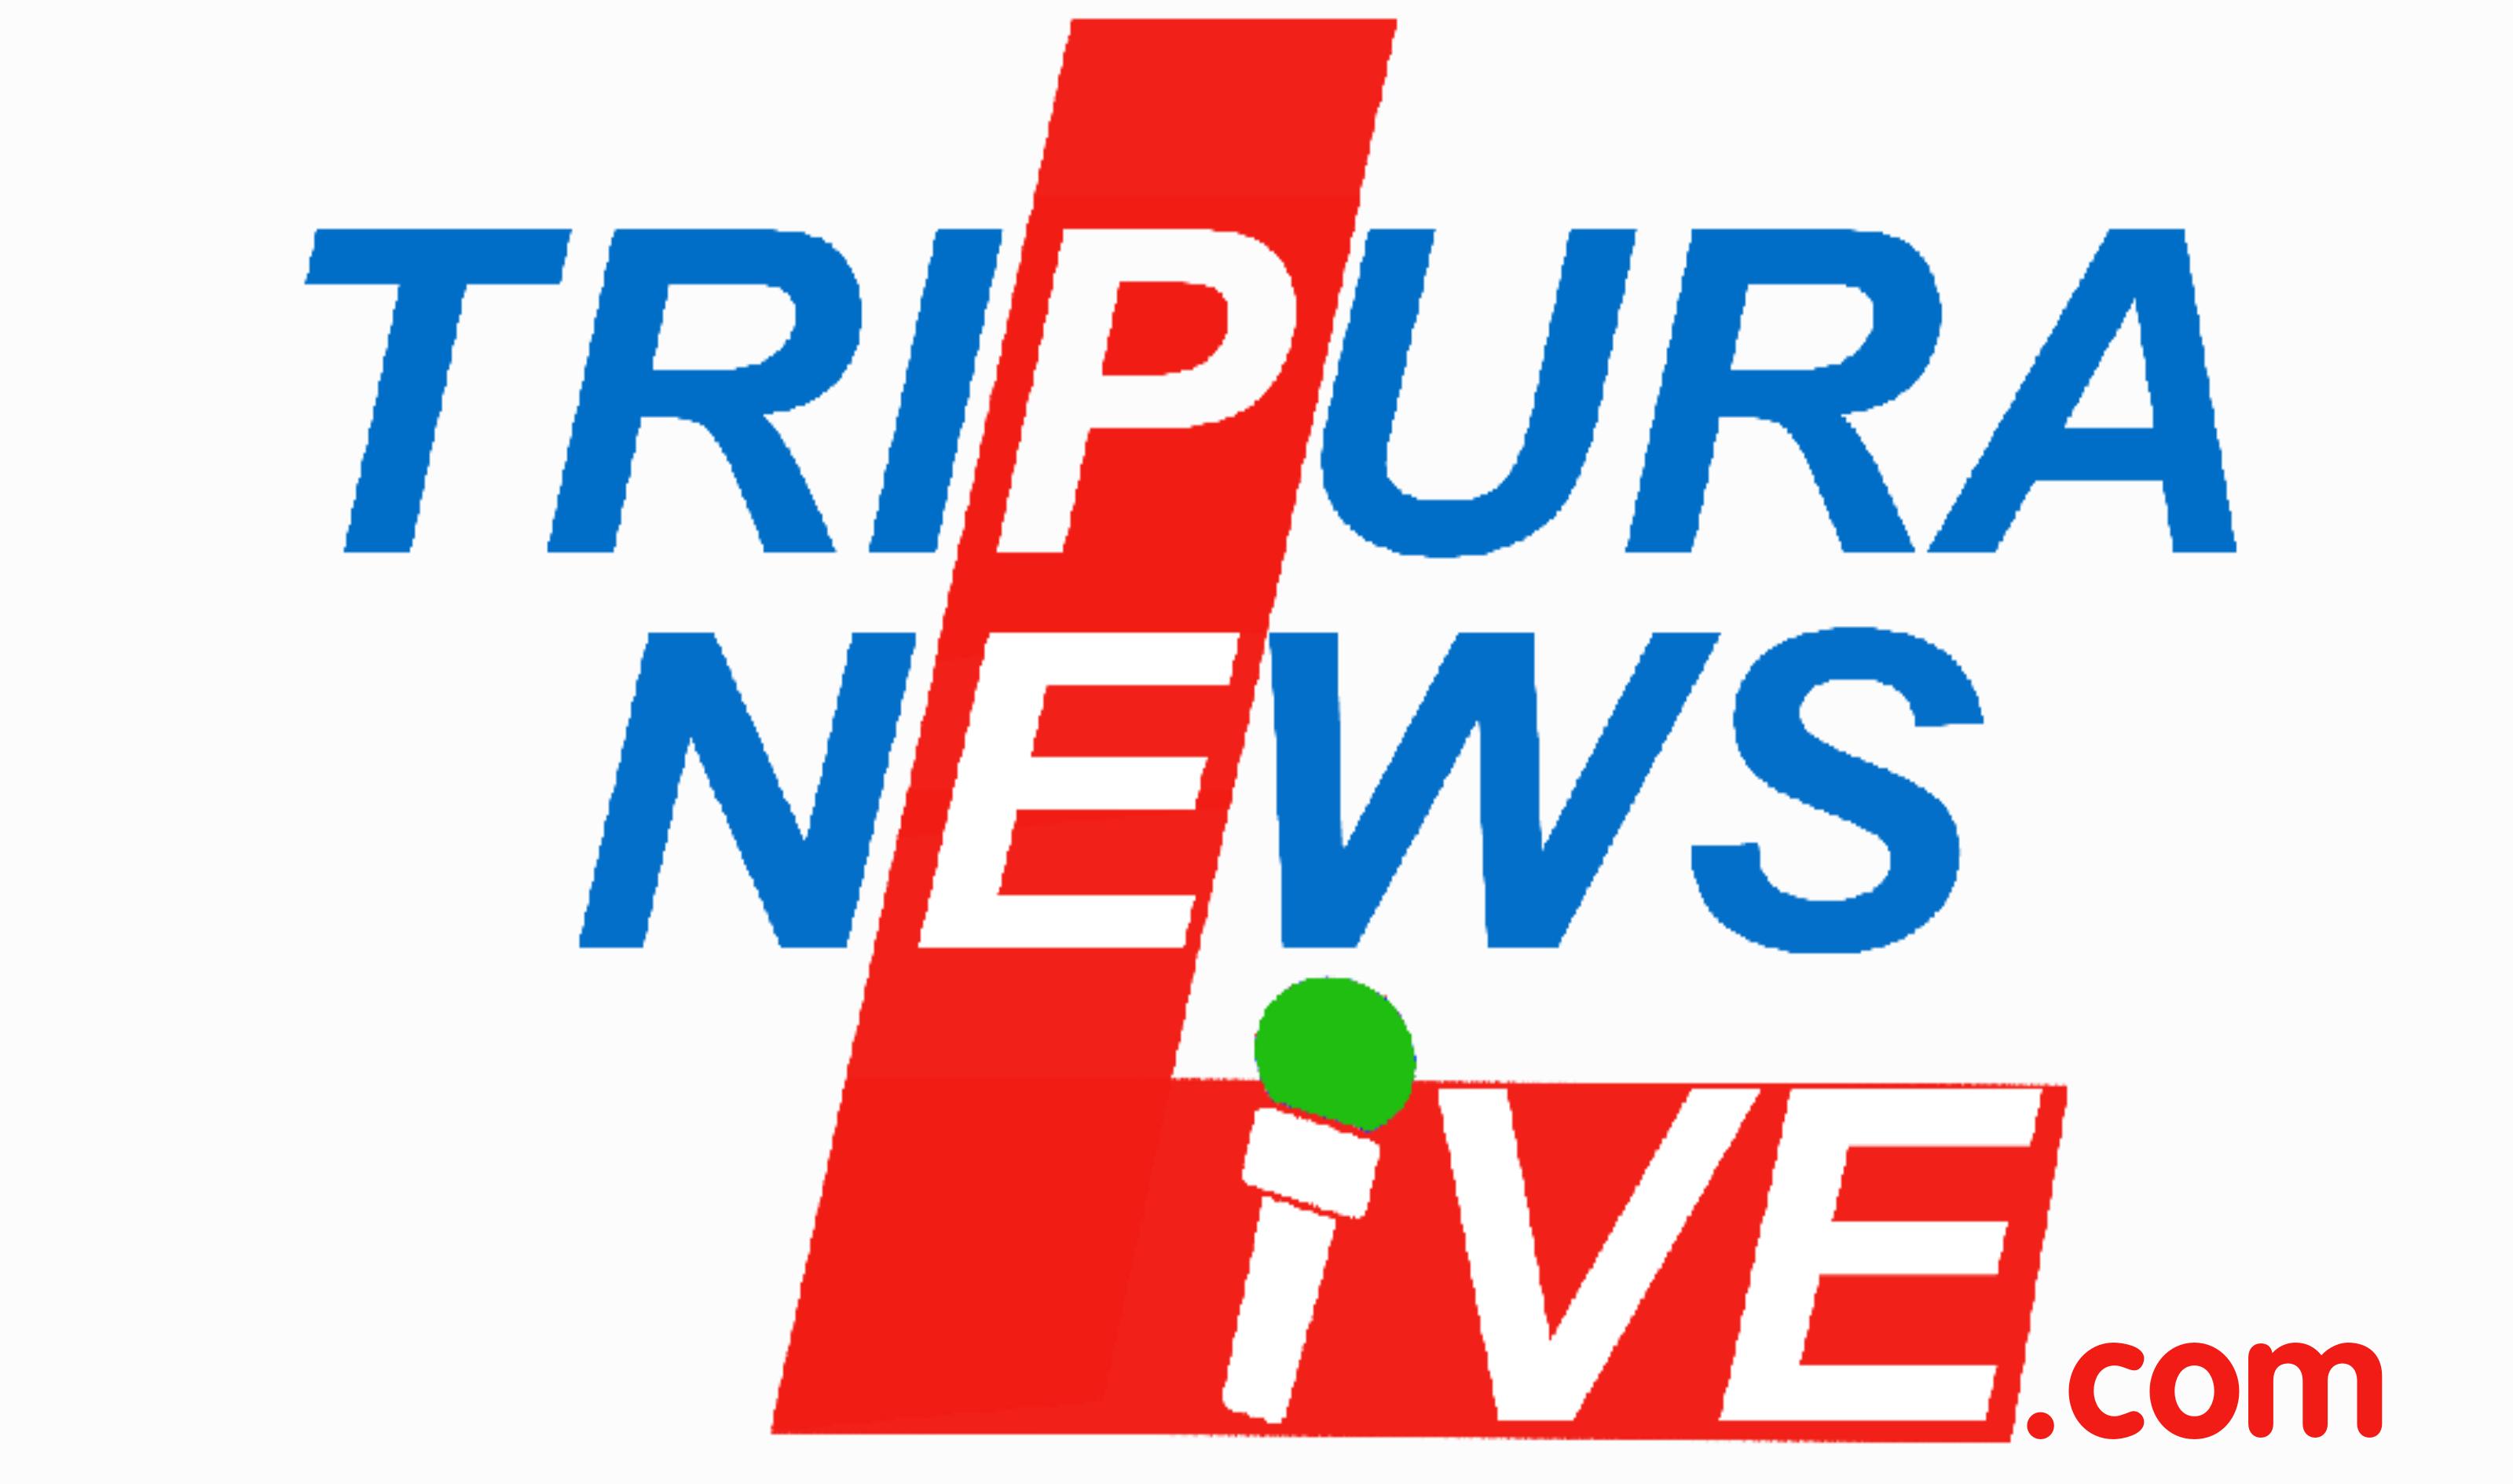 Tripura News Live